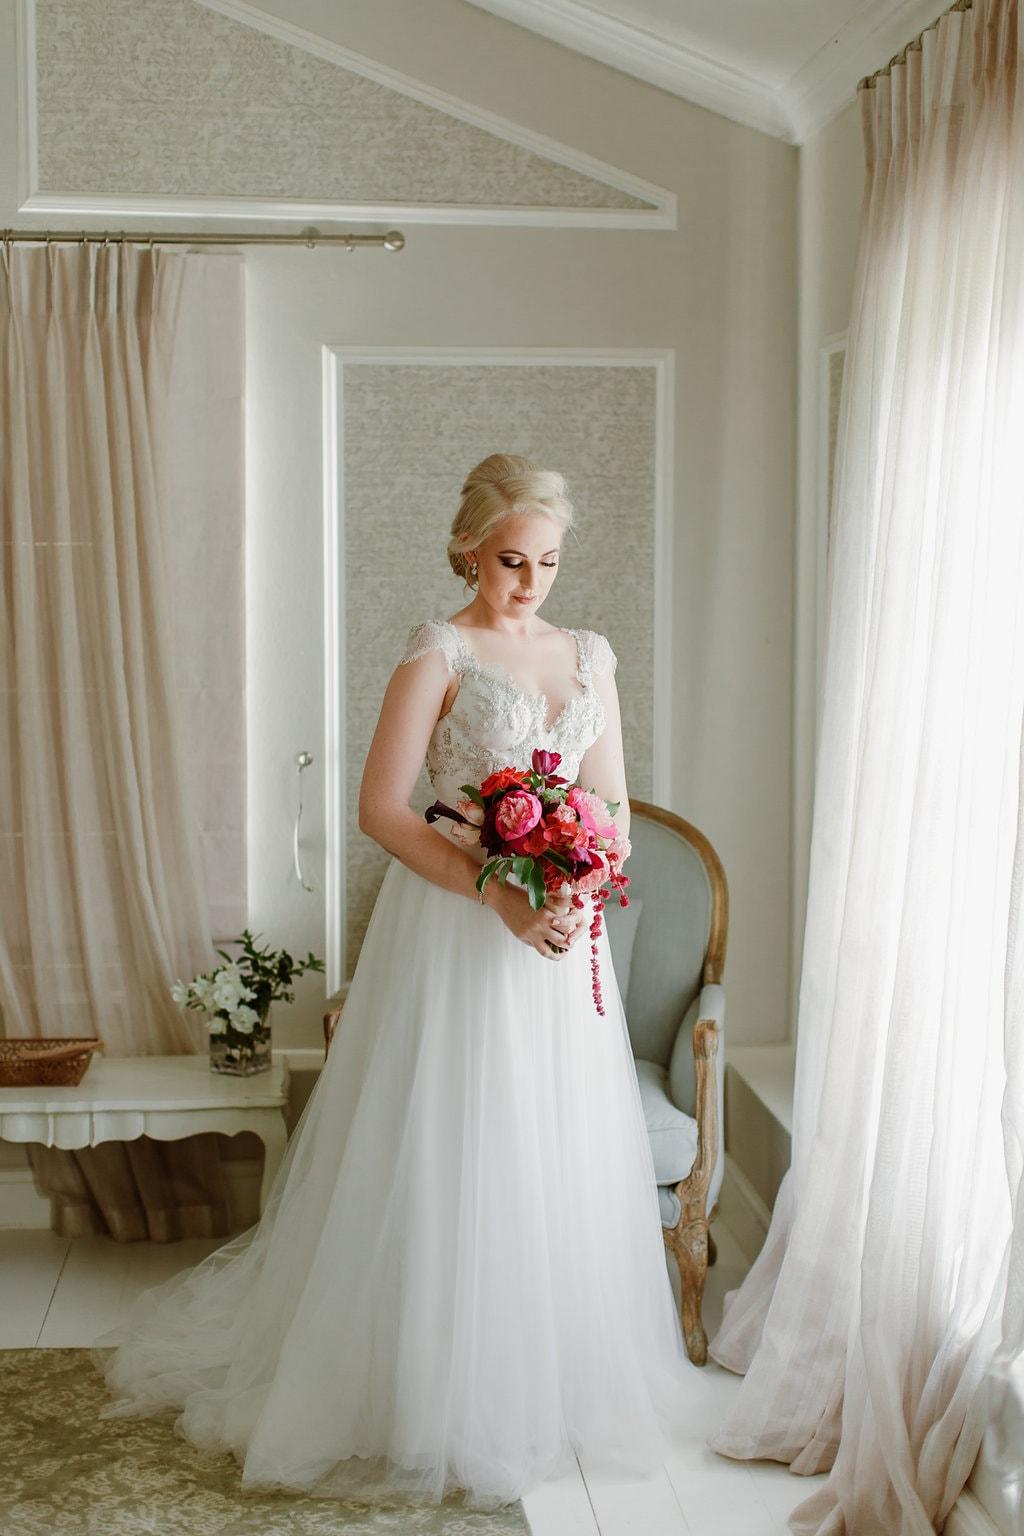 Janita Toerien Wedding Dress | Image: Jenni Elizabeth